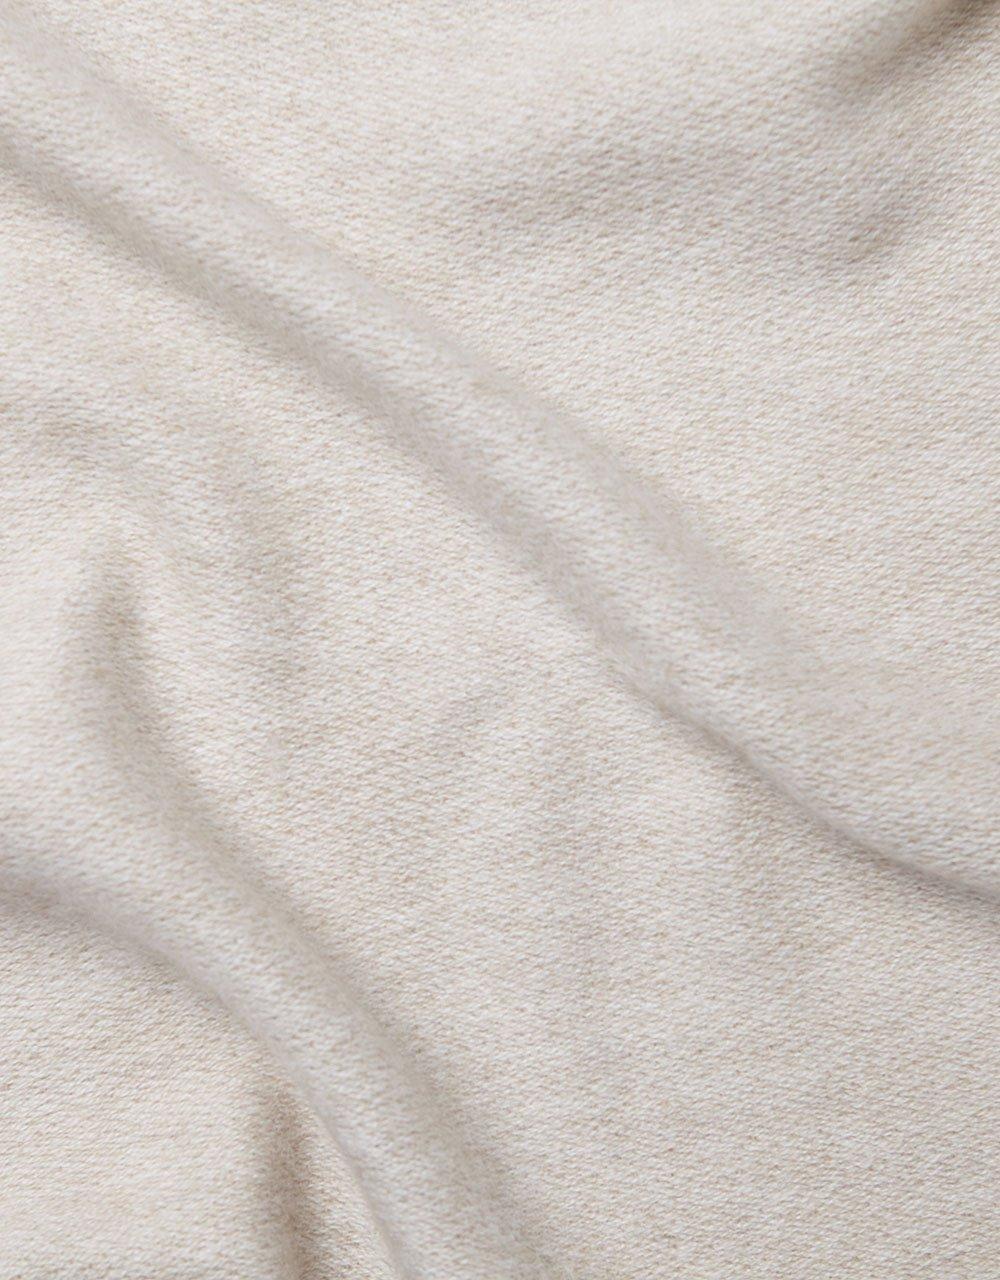 blanket04b